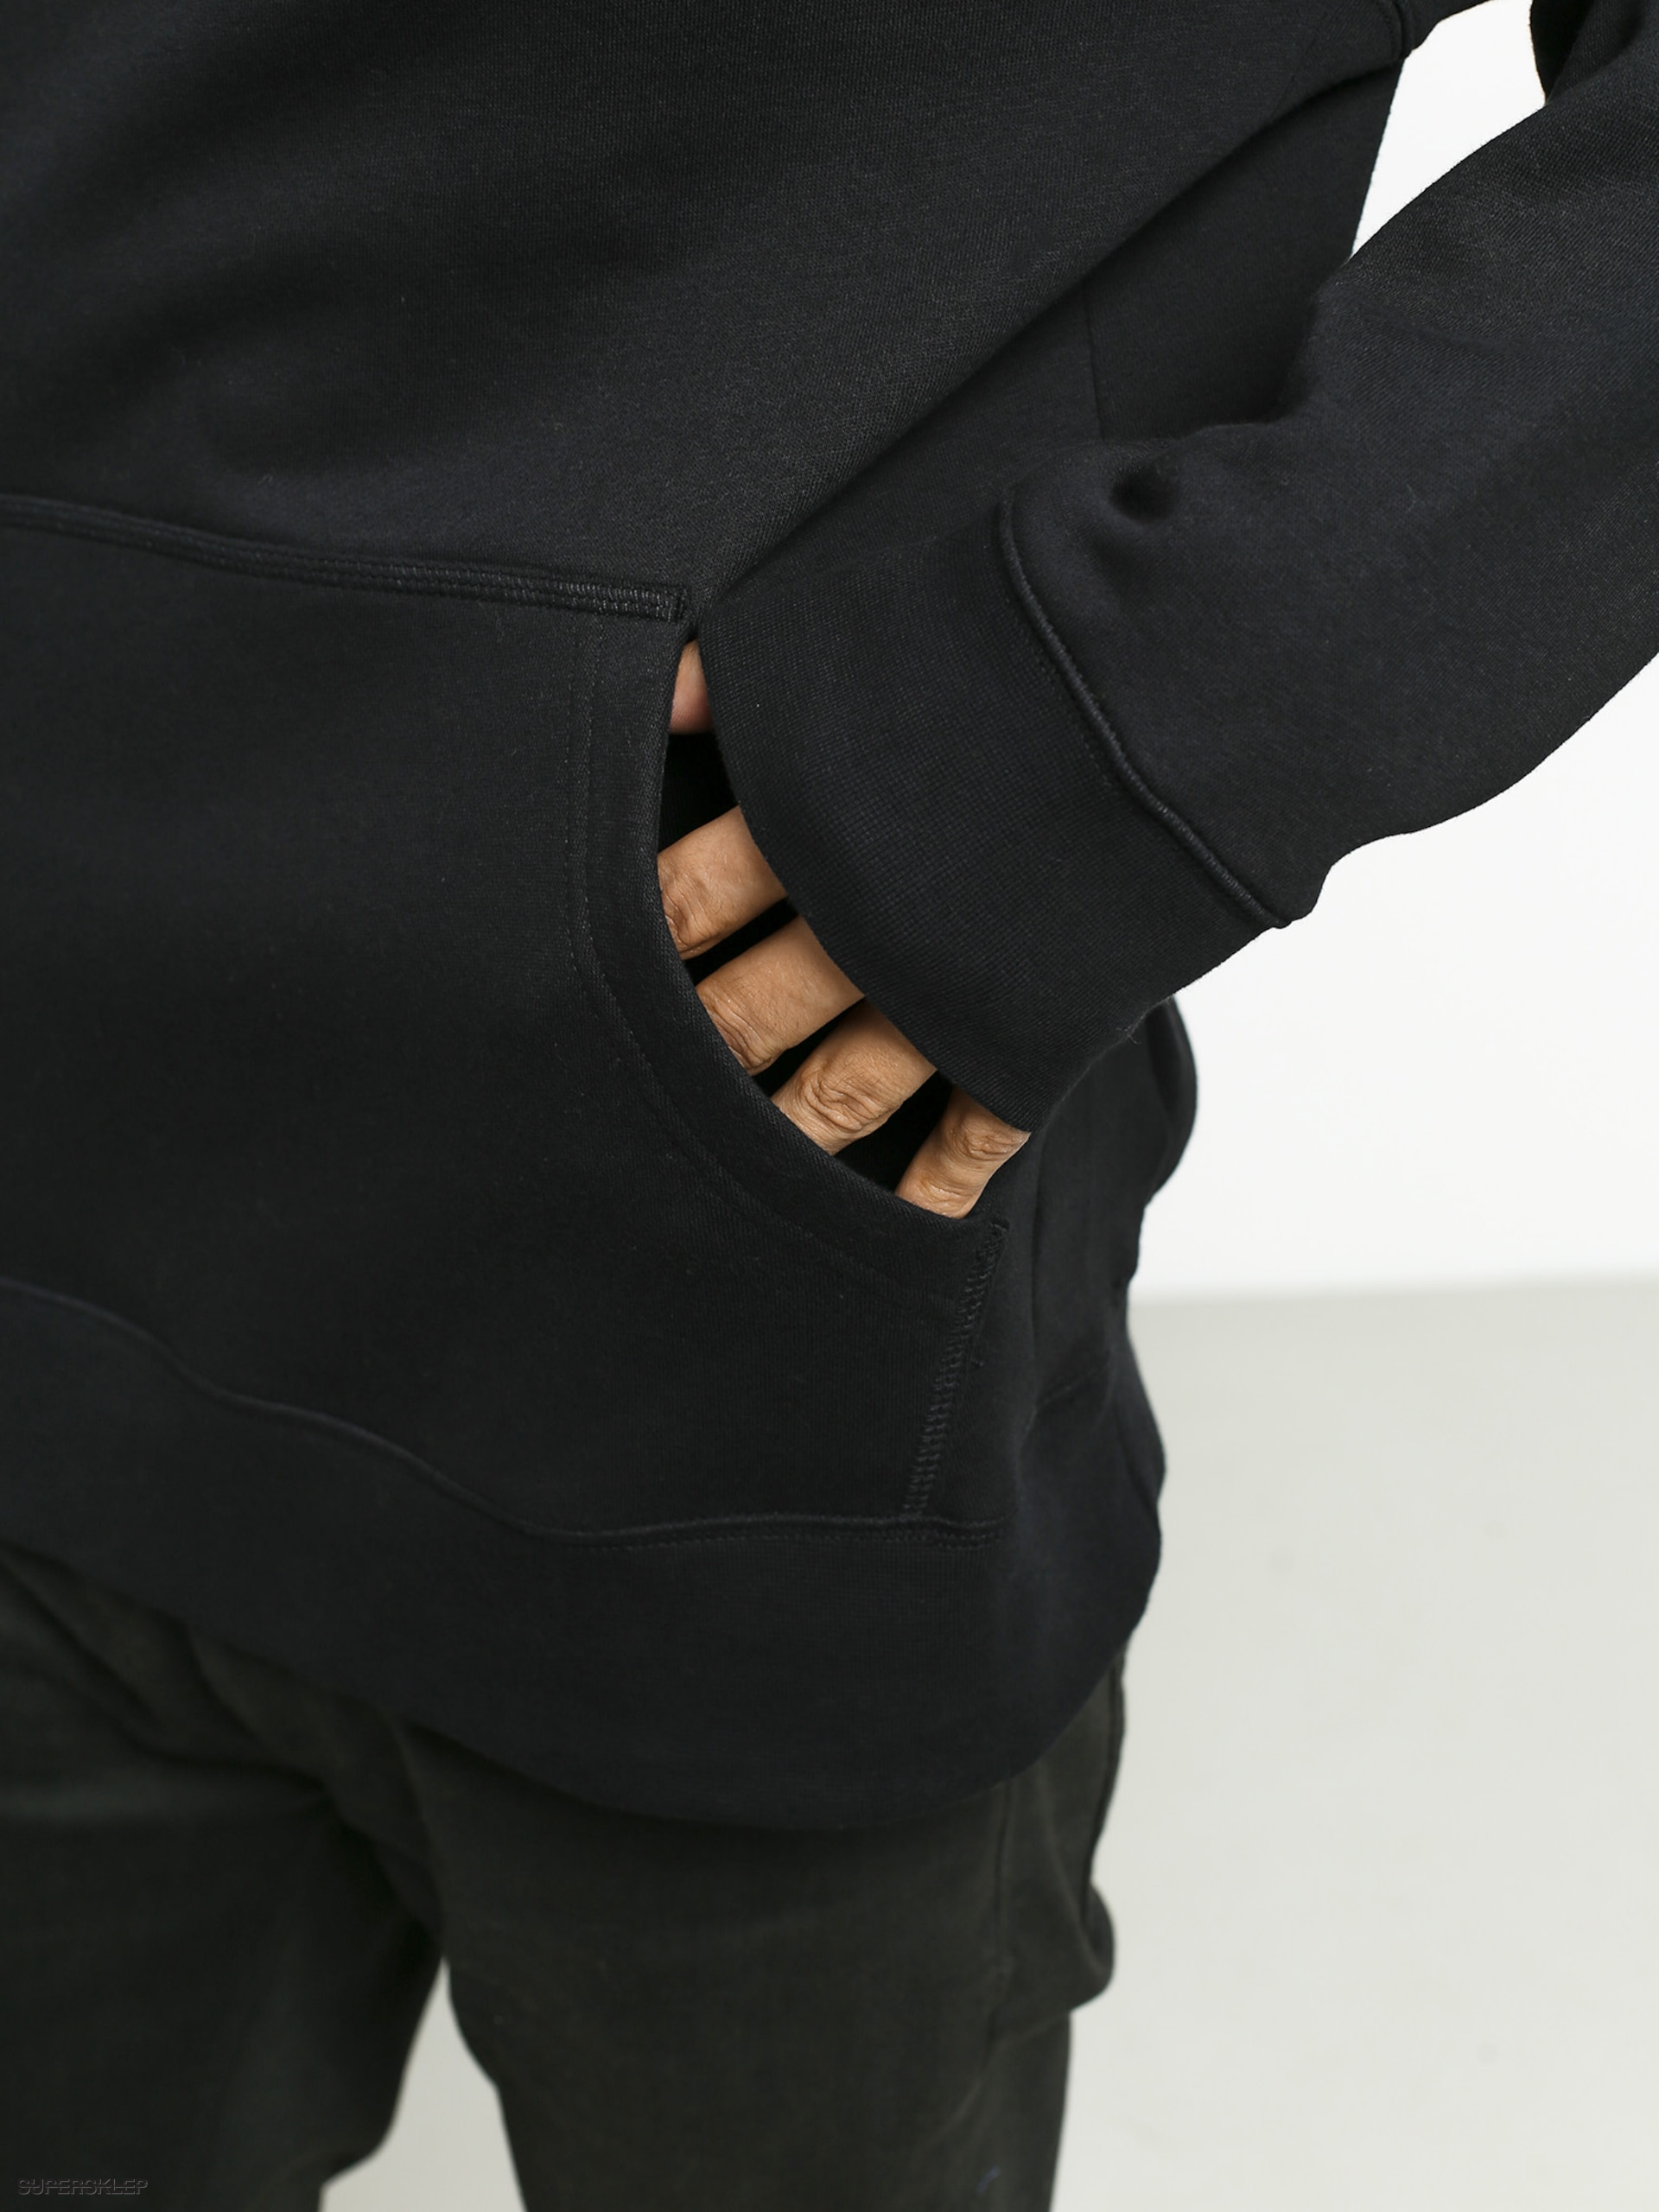 Bluza z kapturem Nike SB Embroidery HD (blacksummit white)